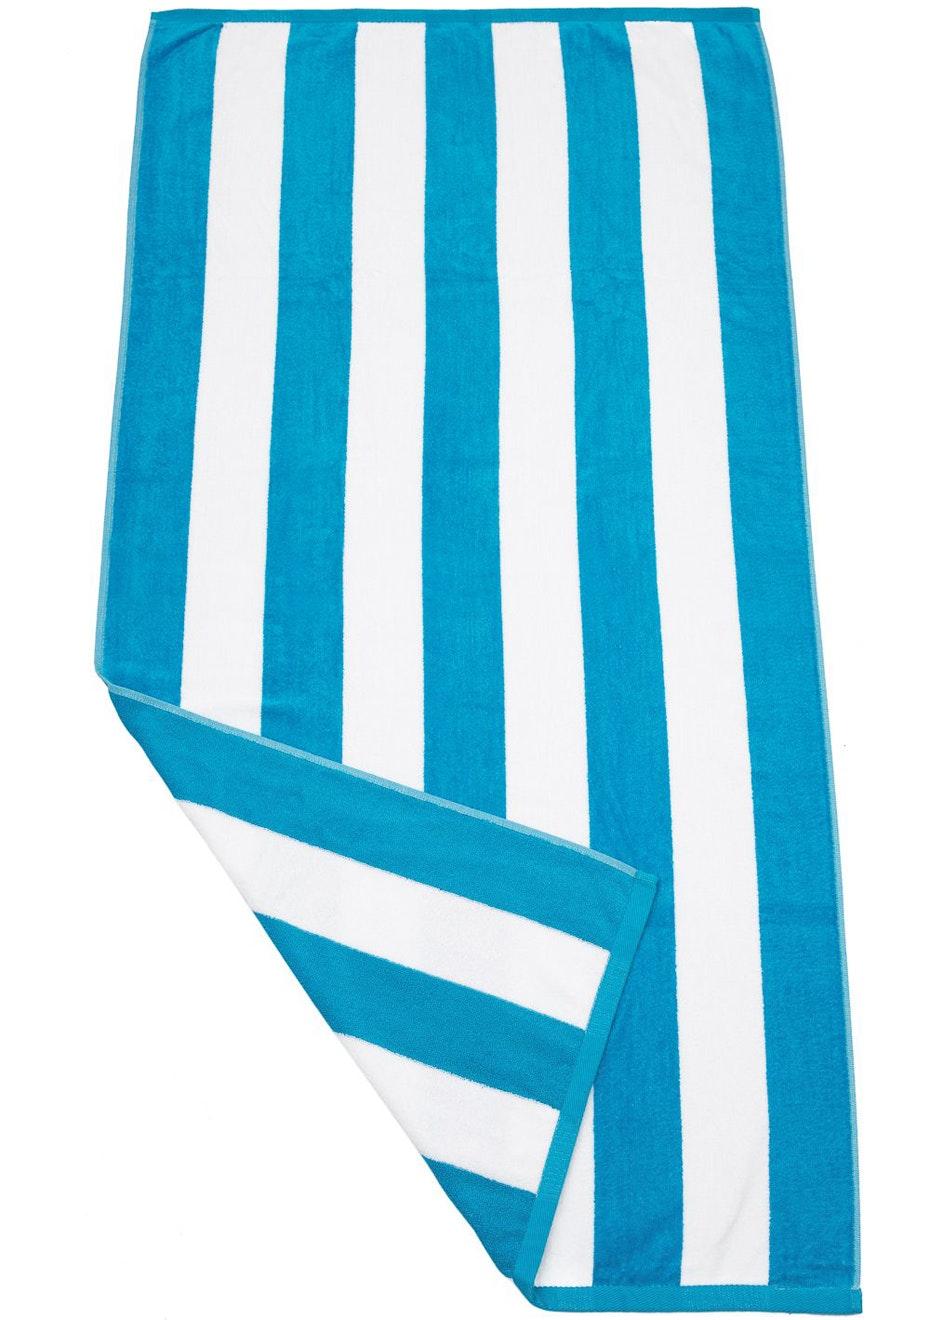 Havana Stripe Beach Towel Aqua/White